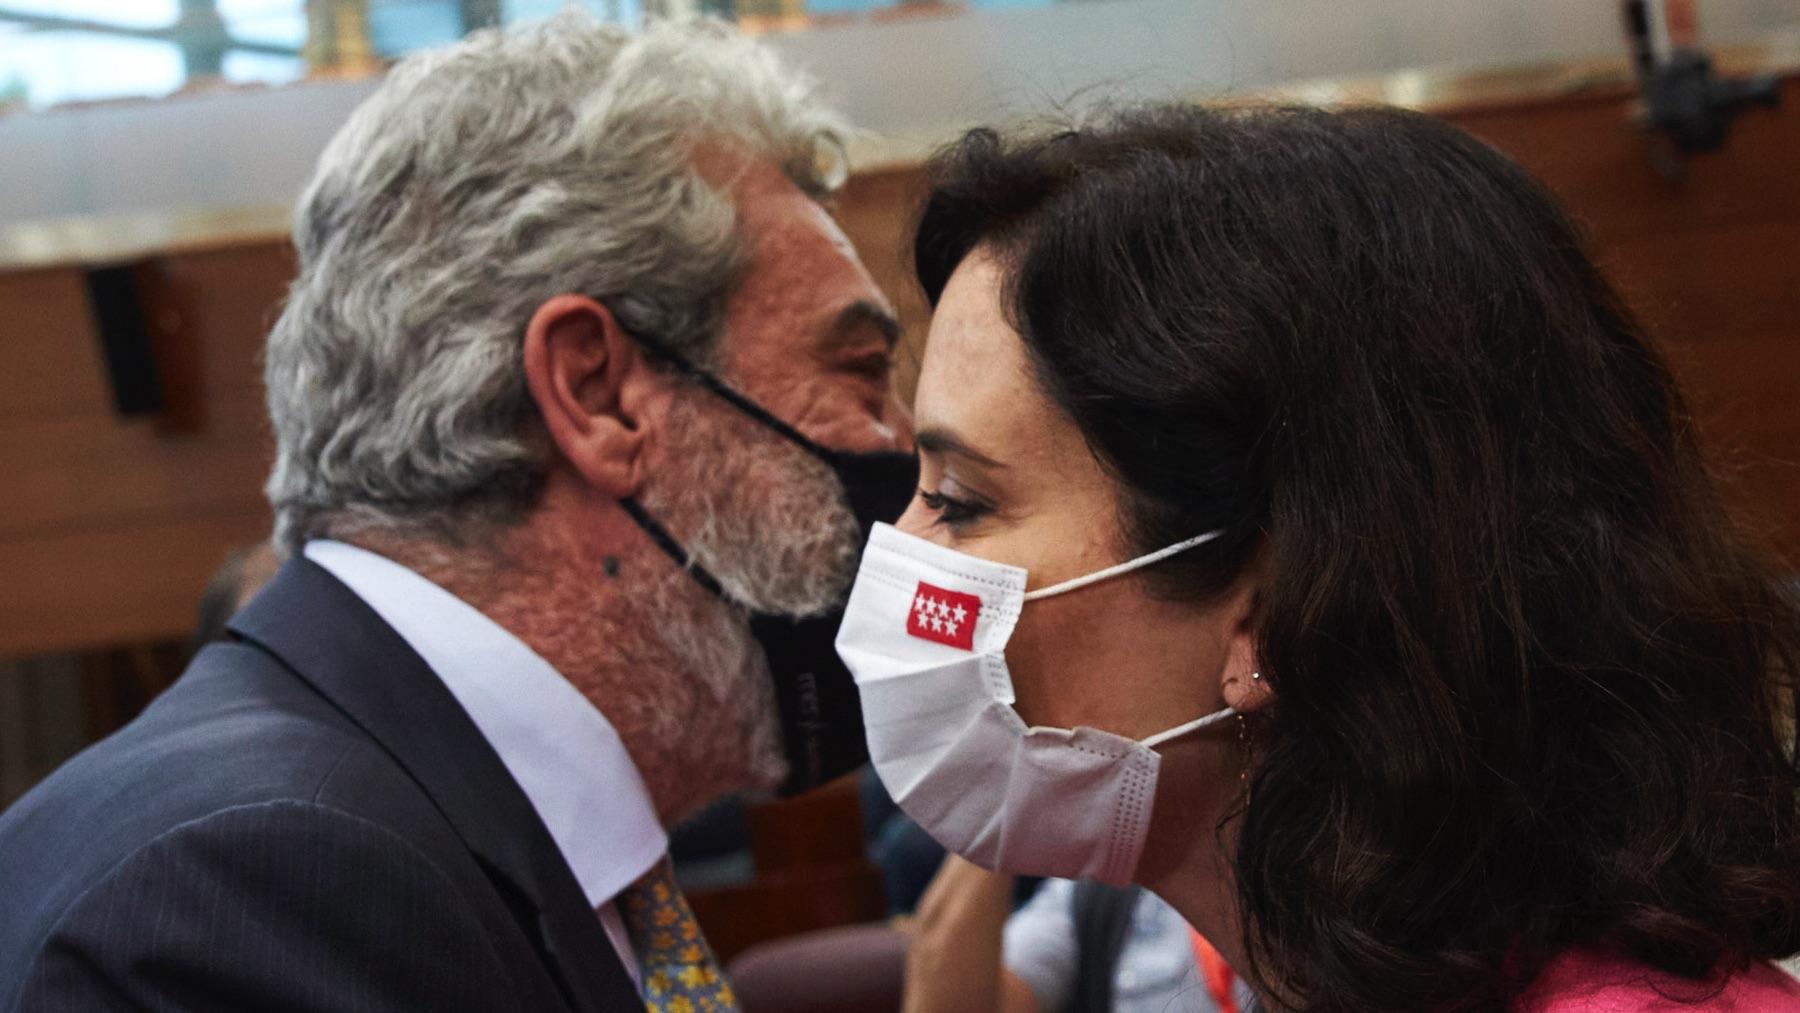 Miguel Ángel Rodríguez e Isabel Díaz Ayuso. (Foto: EP)